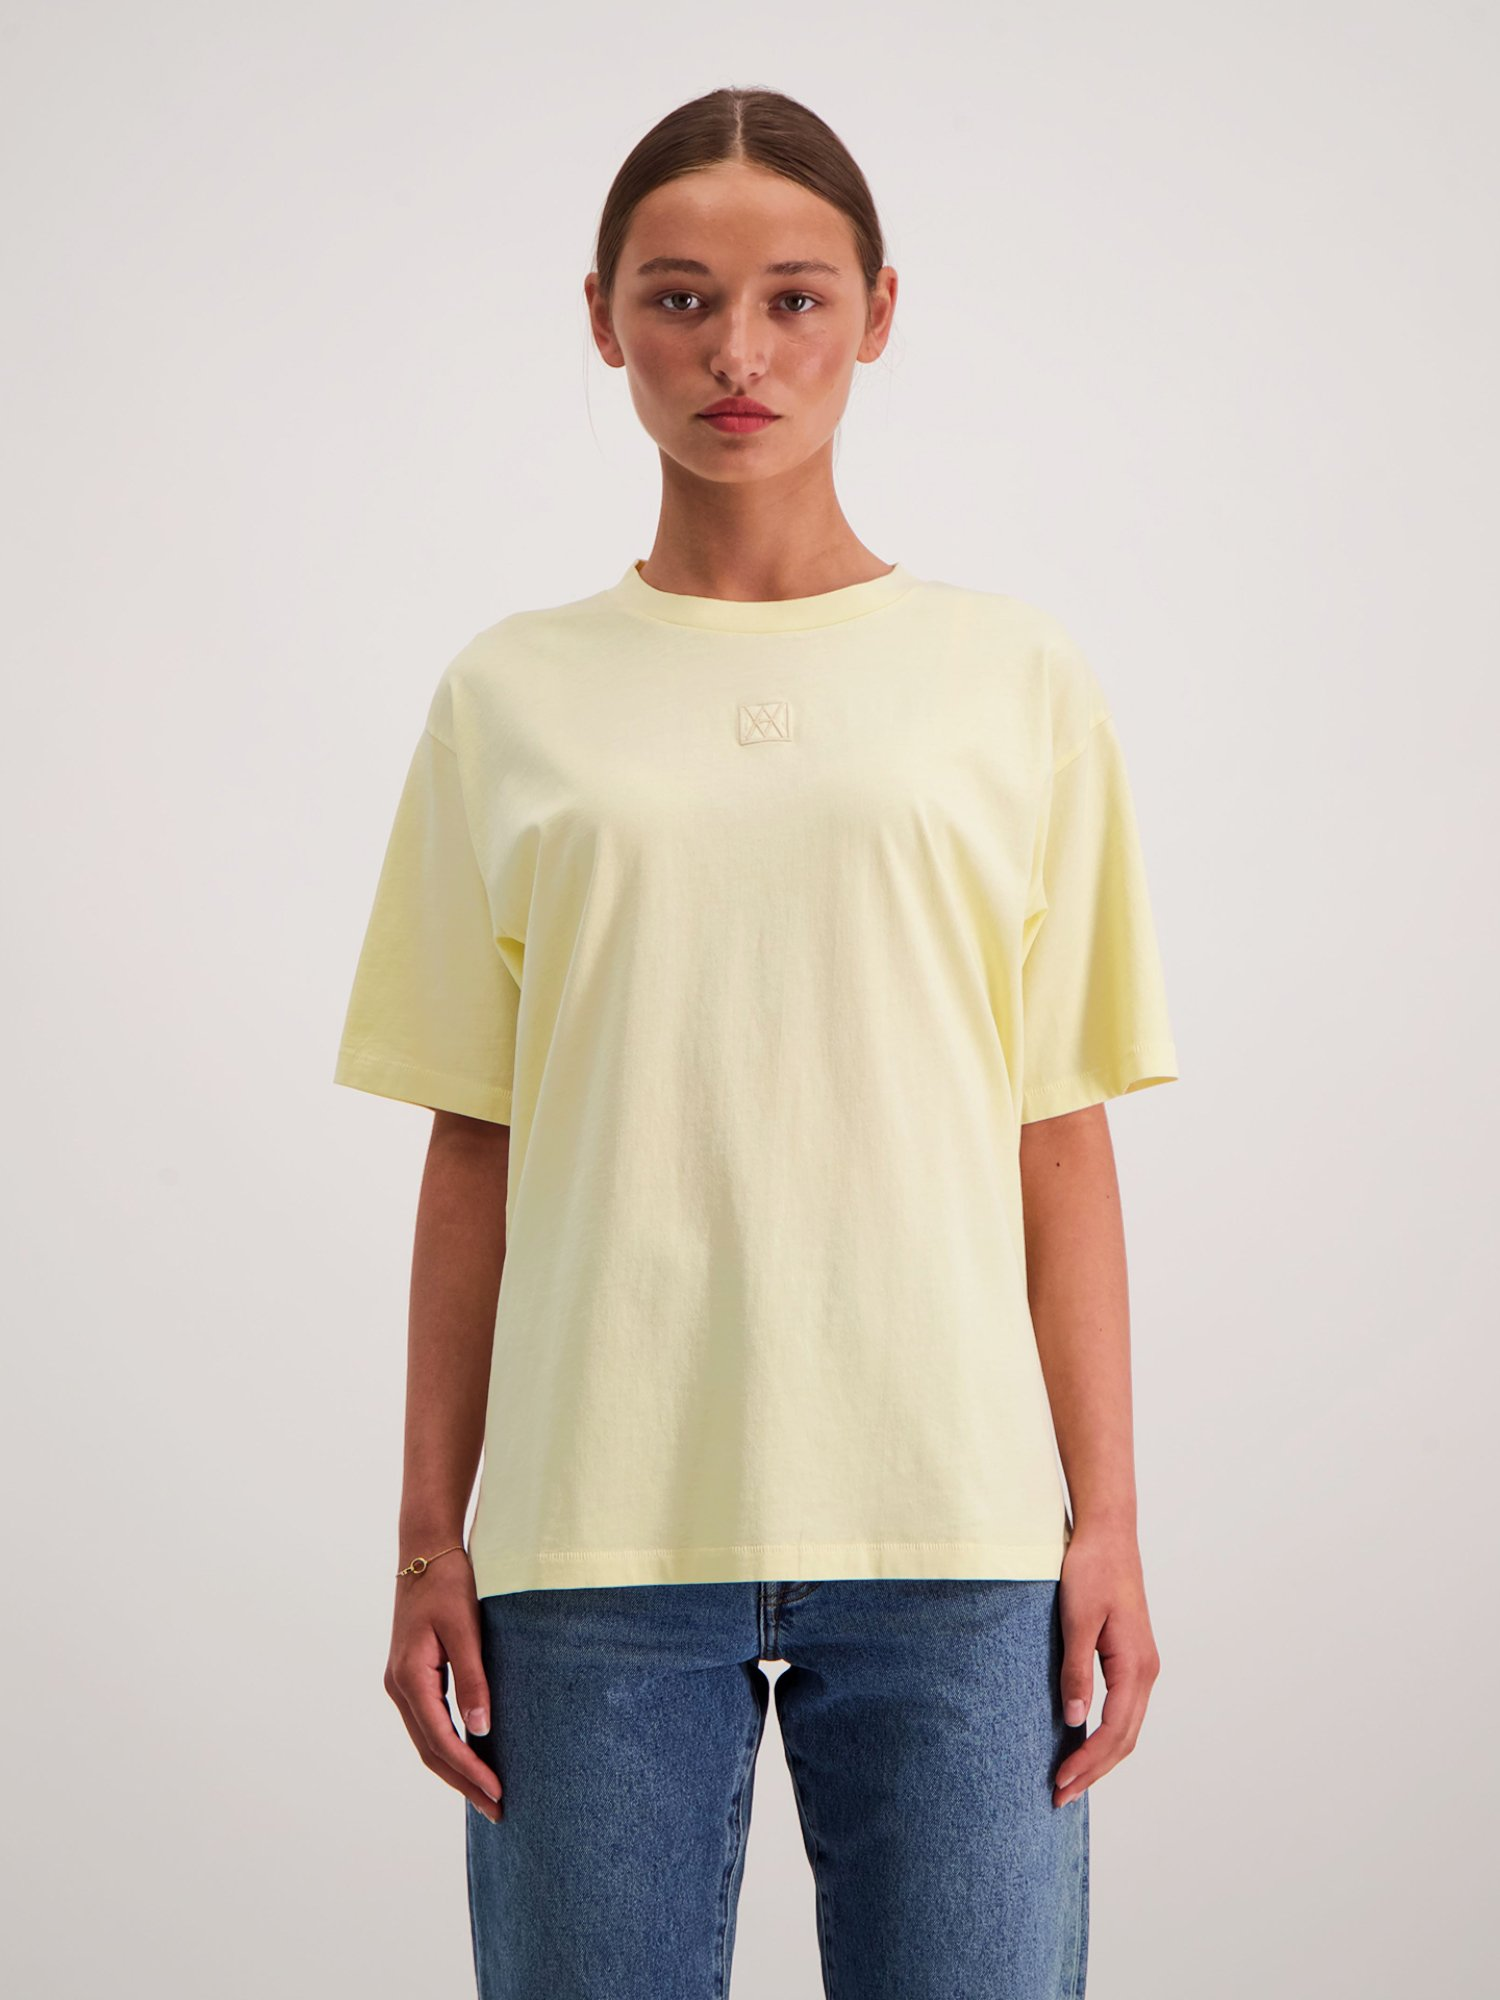 Hanna - Pale Yellow